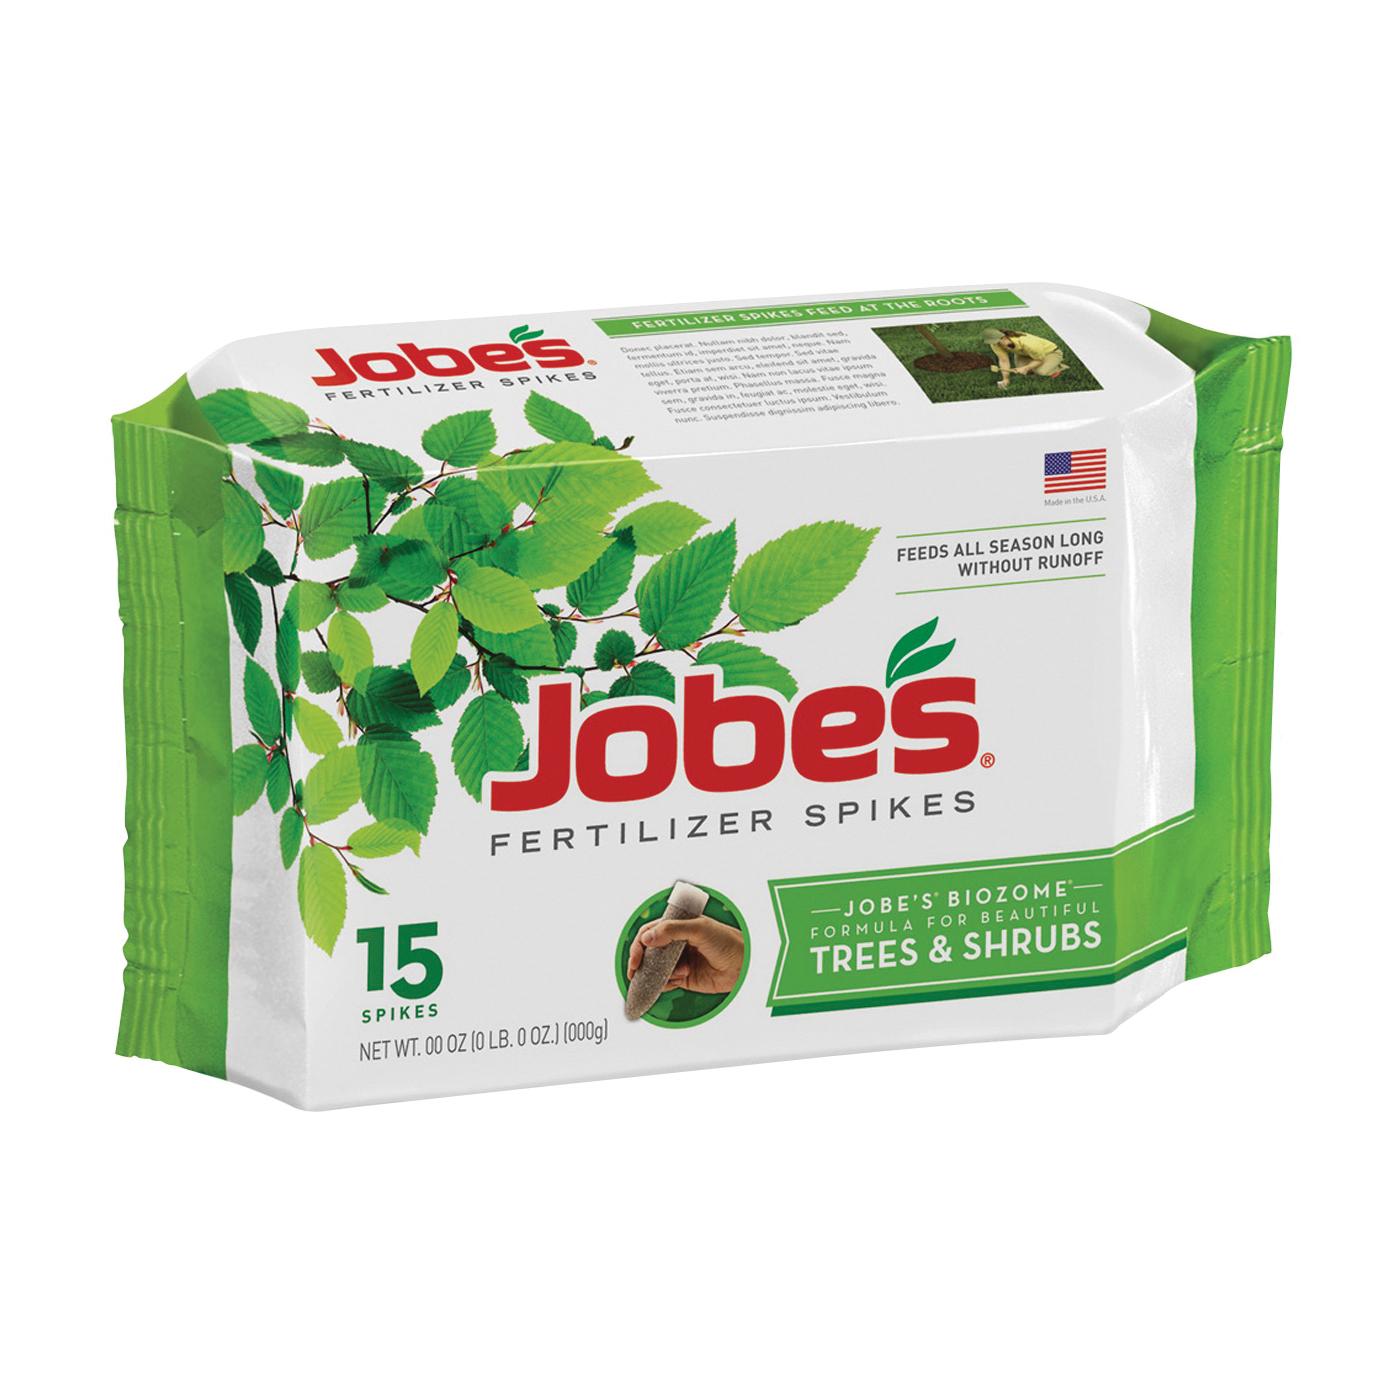 Picture of Jobes 01610 Fertilizer Spike Pack, Spike, Gray/Light Brown, Slight Ammonia, Pack